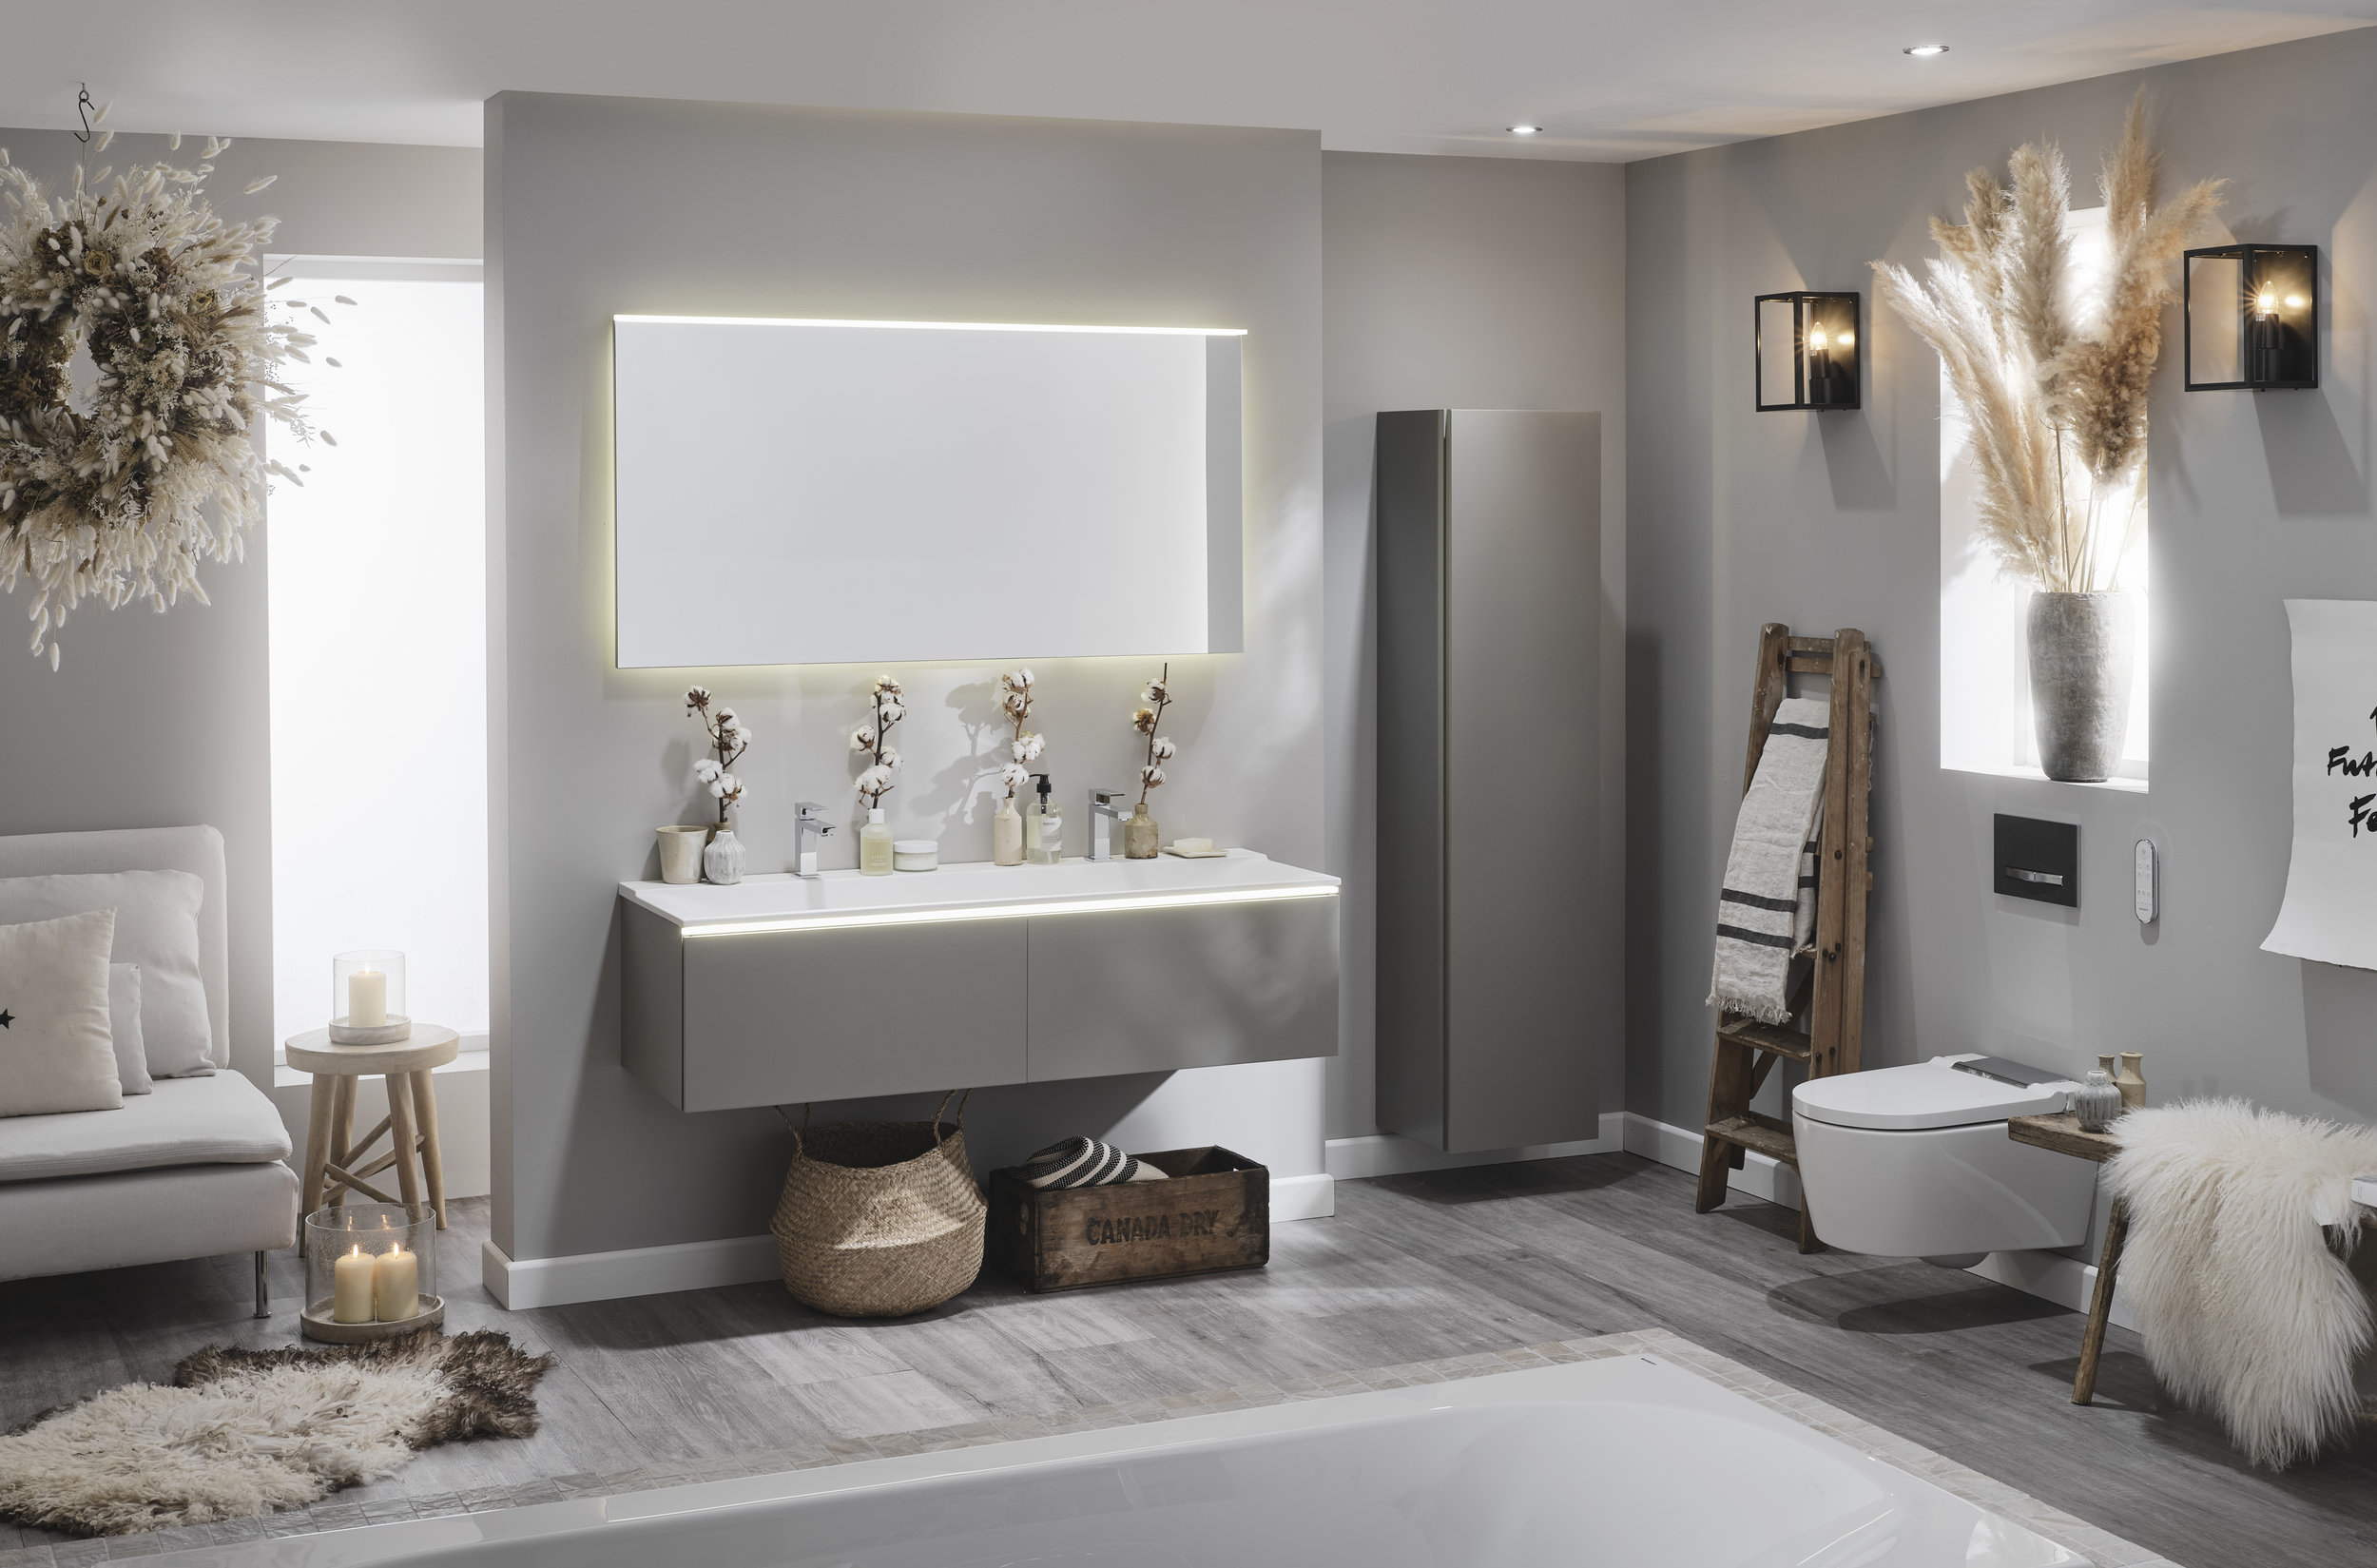 My Rustic Scandi Dream Bathroom scheme